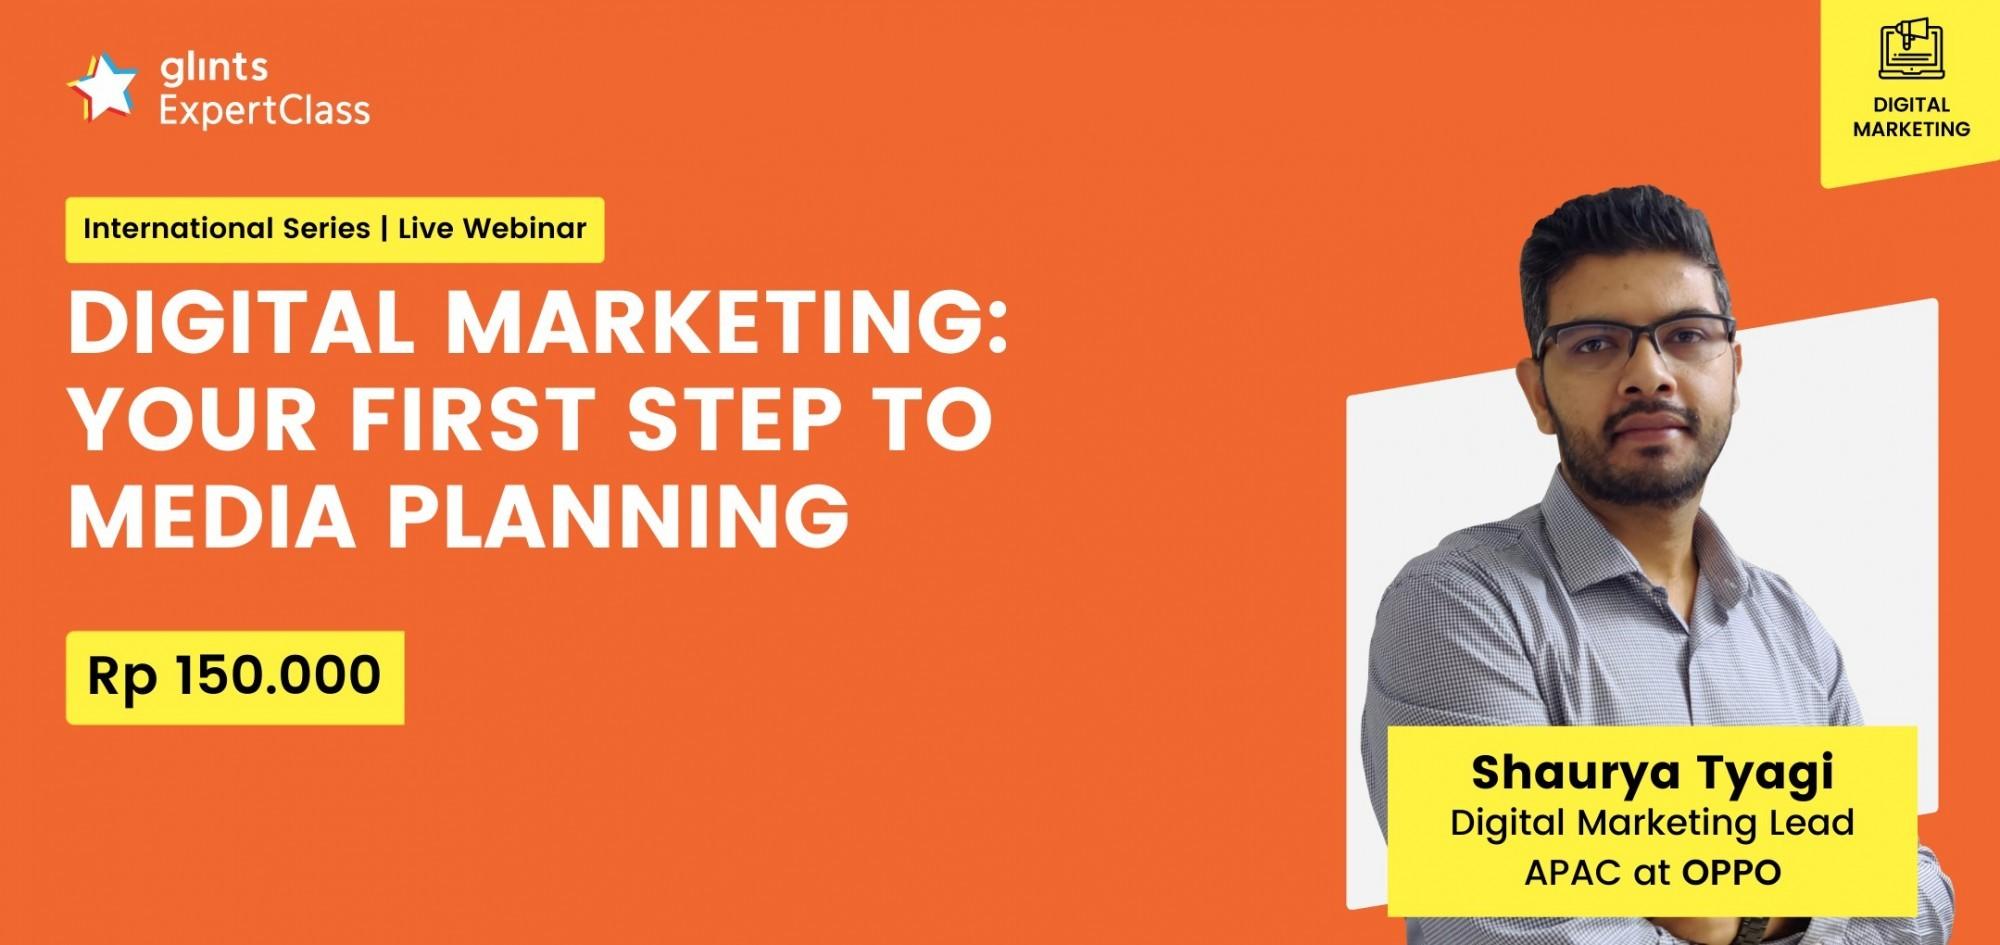 [GEC International Series] Digital Marketing: Your First Step to Media Planning